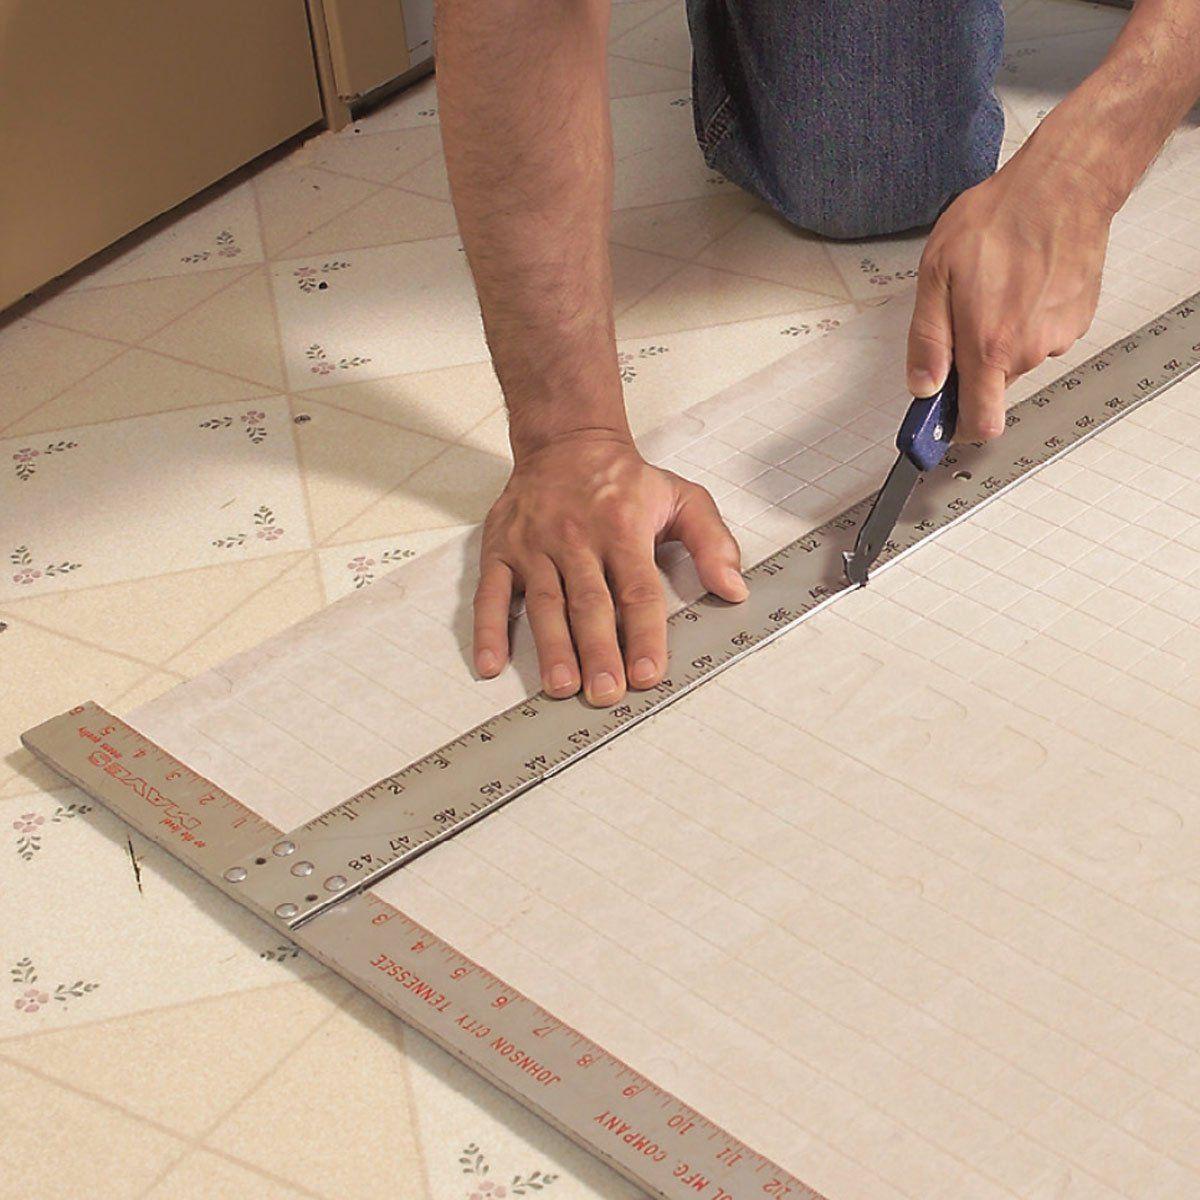 How To Install Ceramic Tile Floor In The Bathroom Ceramic Floor Tiles Mosaic Tile Bathroom Floor Installing Tile Floor